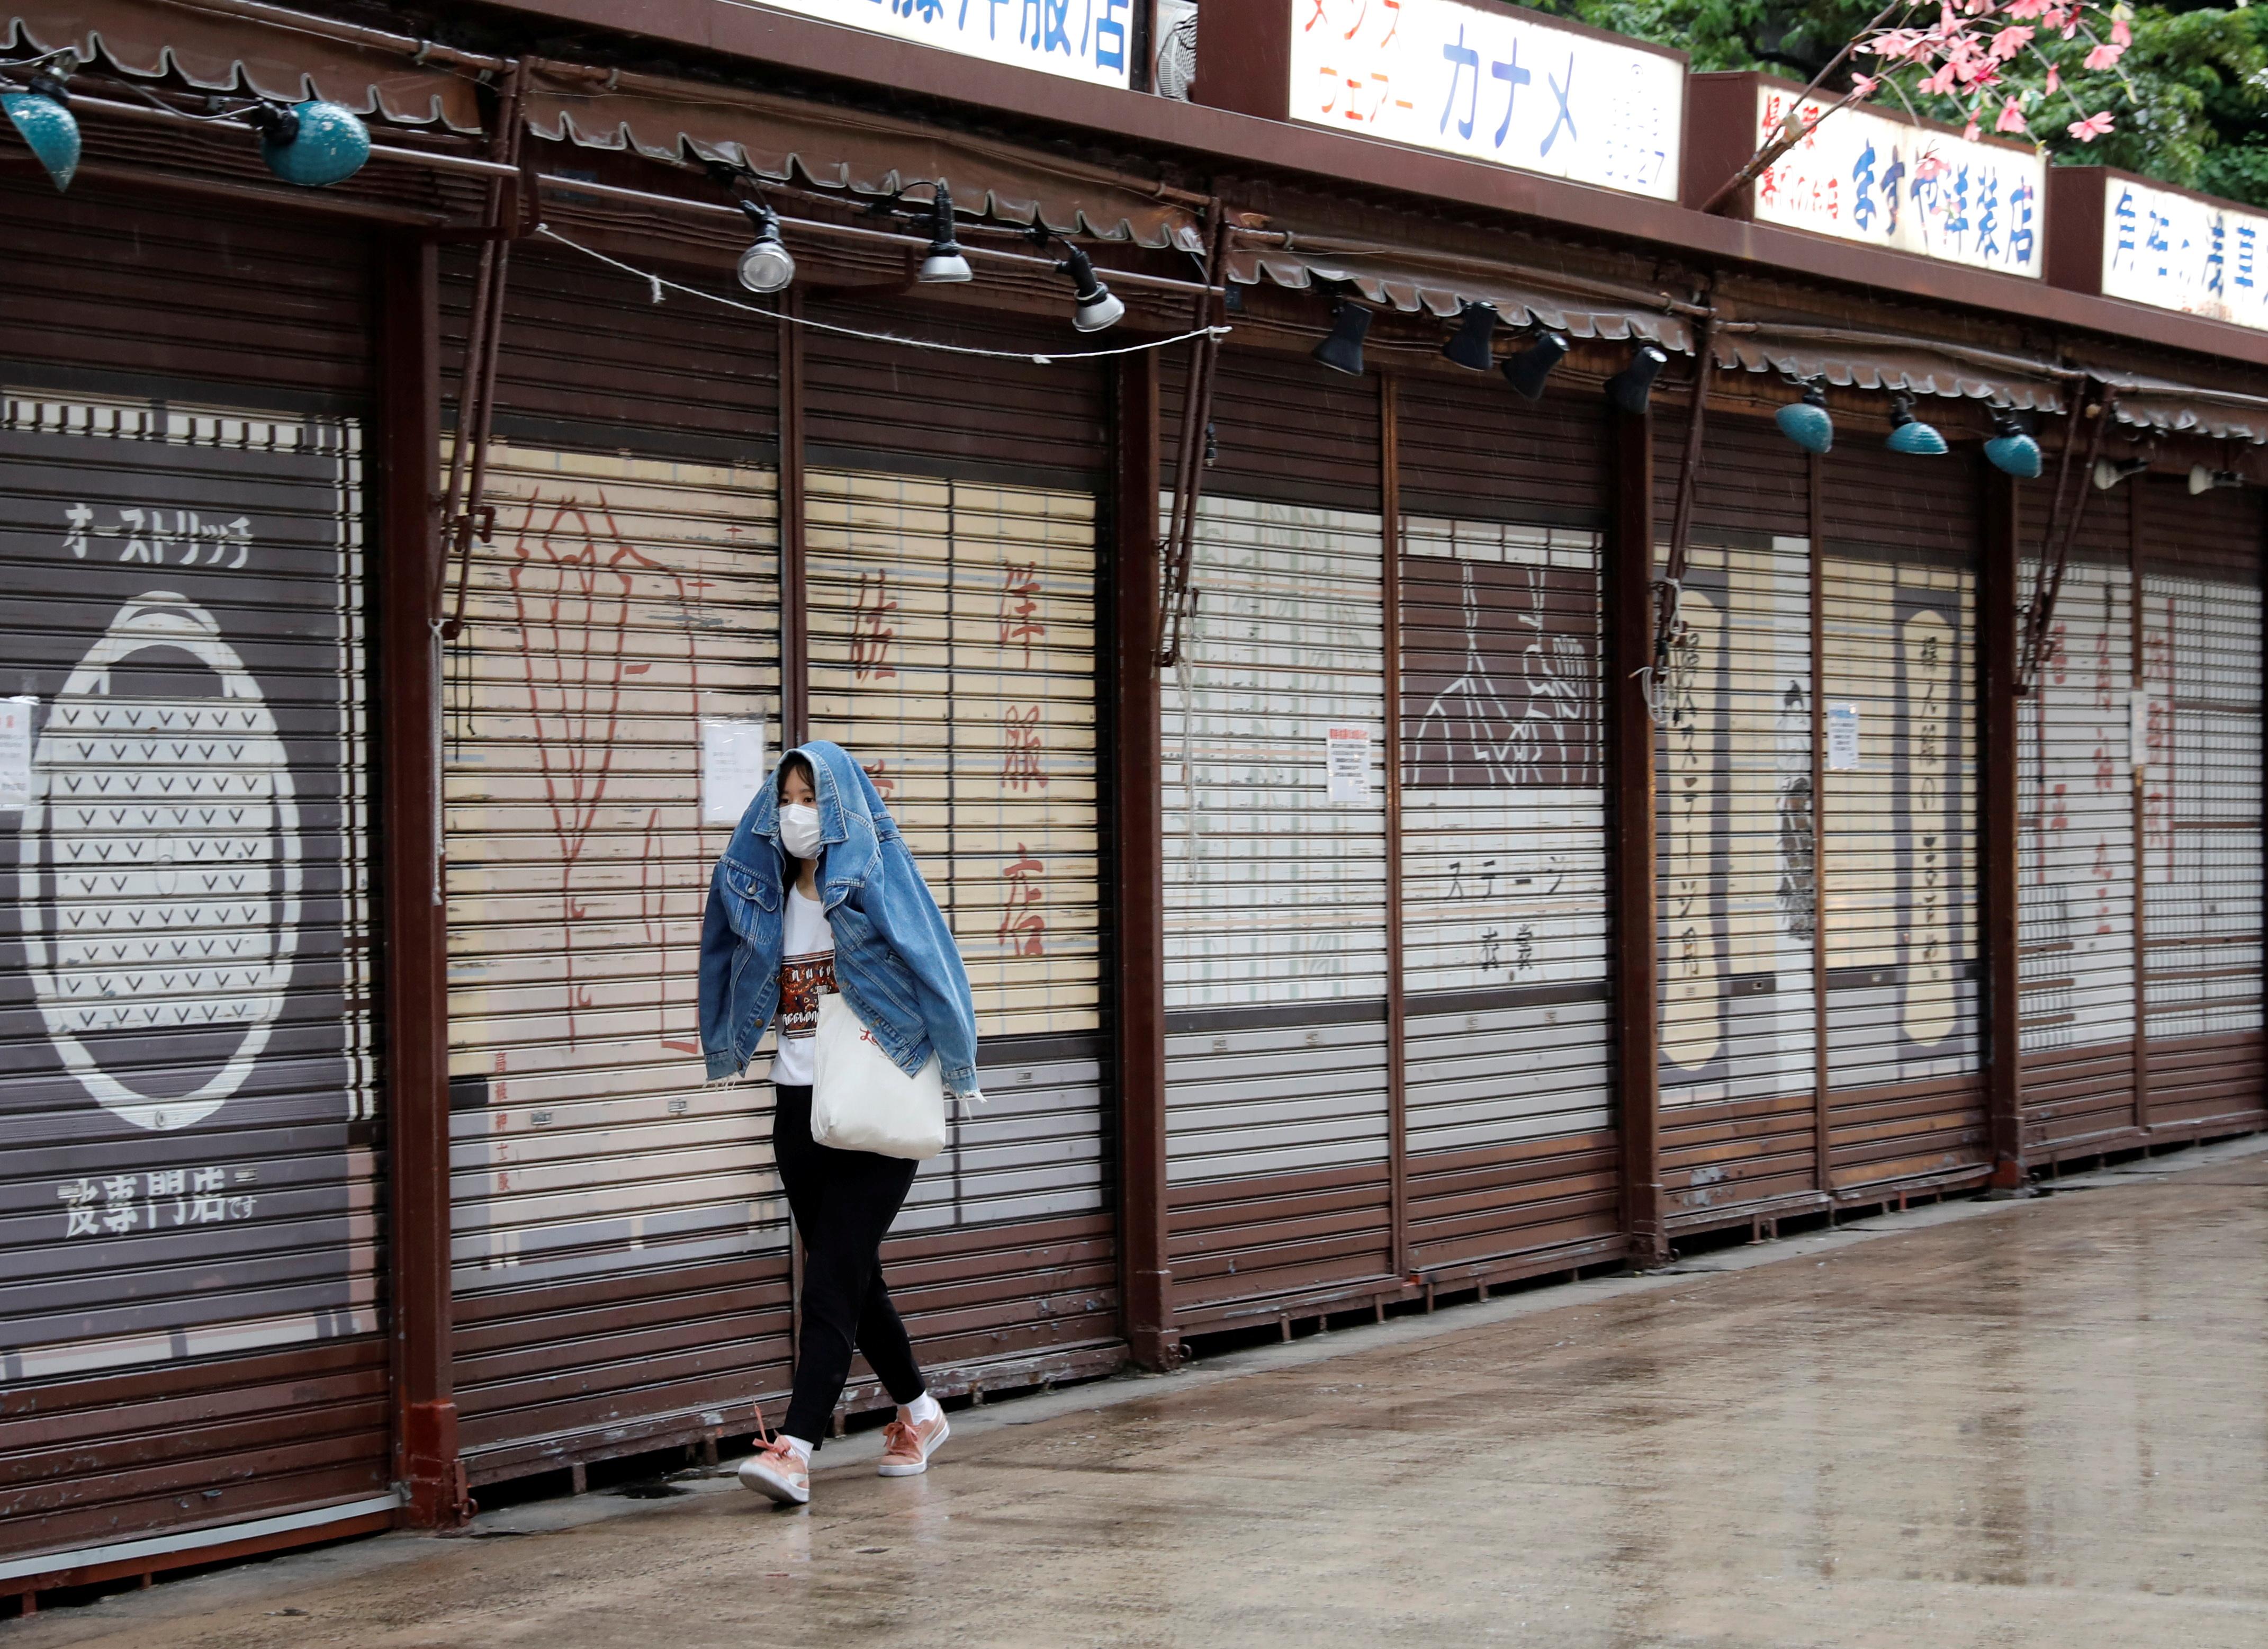 A woman wearing a protective face mask, amid the coronavirus disease (COVID-19) pandemic, walks past closed shops in Asakusa district in Tokyo, Japan, May 7, 2021. REUTERS/Kim Kyung-Hoon